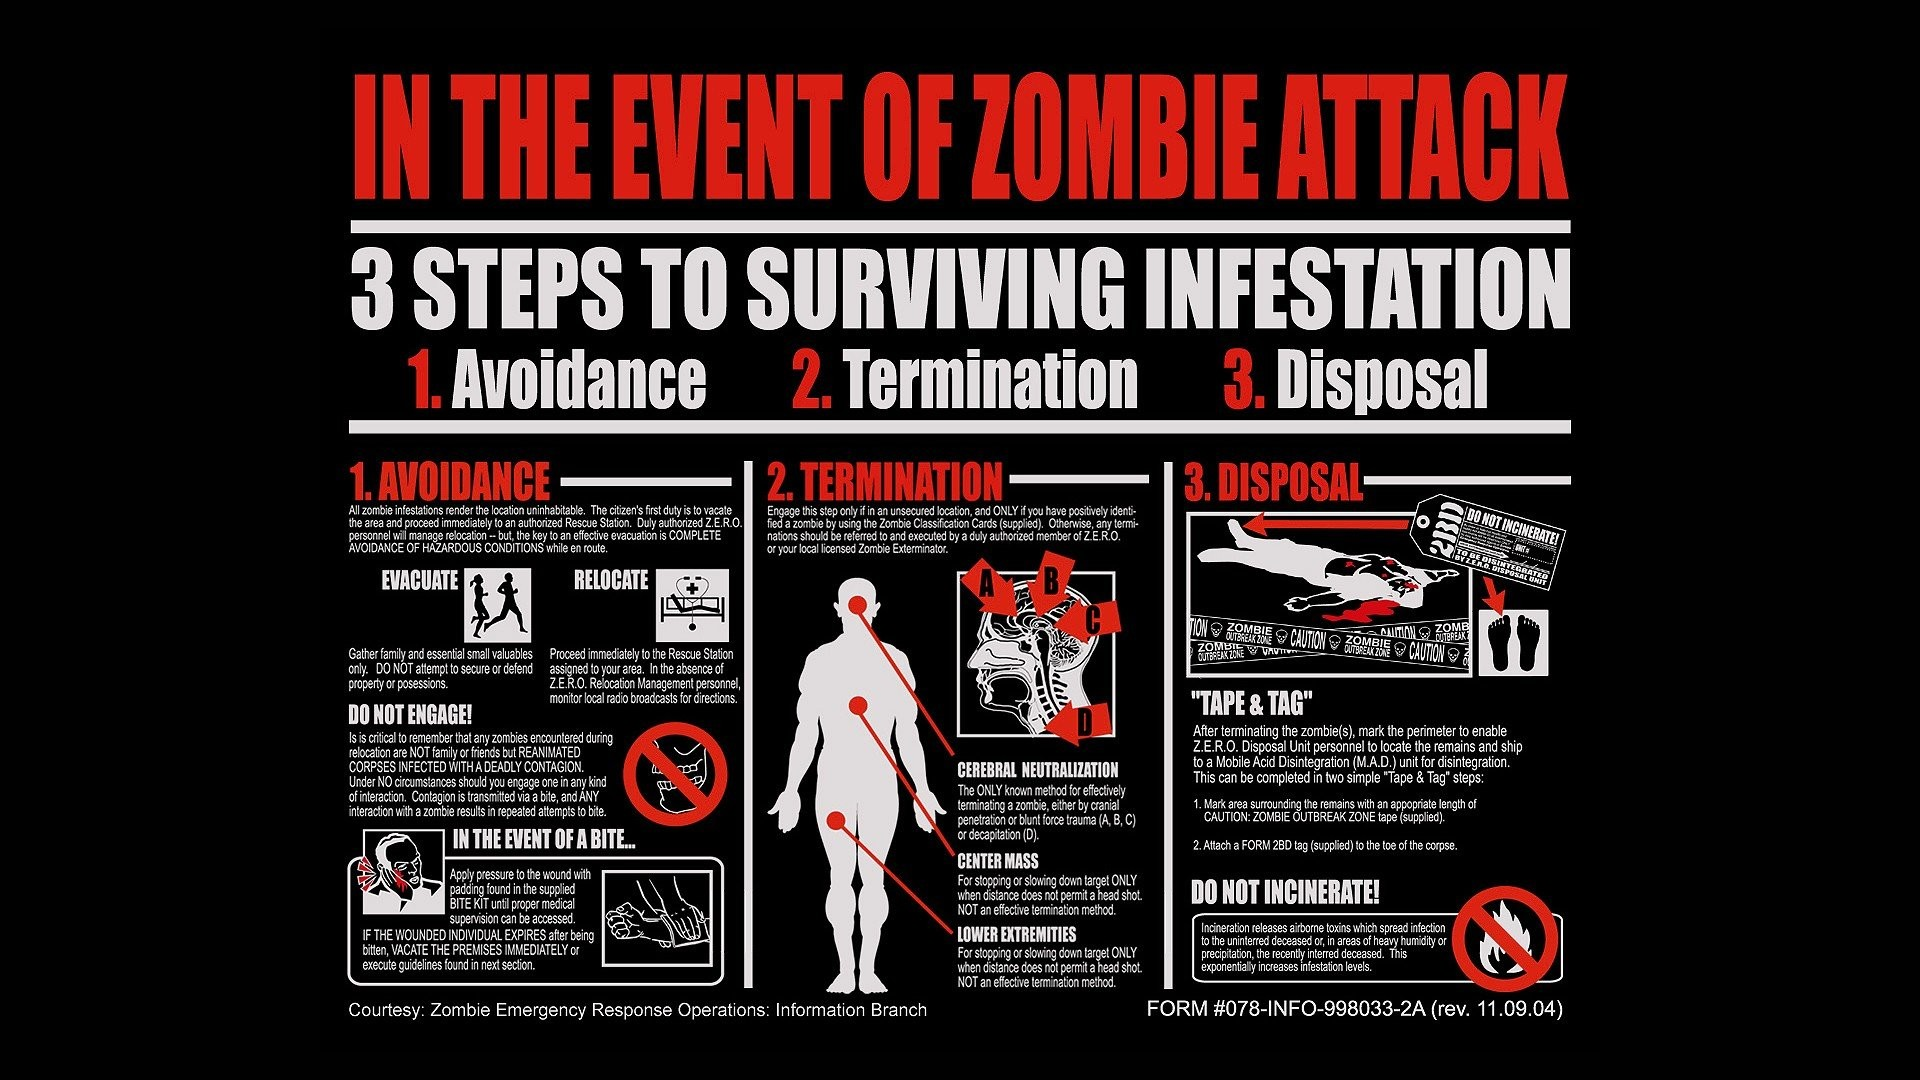 Survive a zombie apocalypse wallpaper widescreen desktop mobile iphone  android hd wallpaper and desktop.